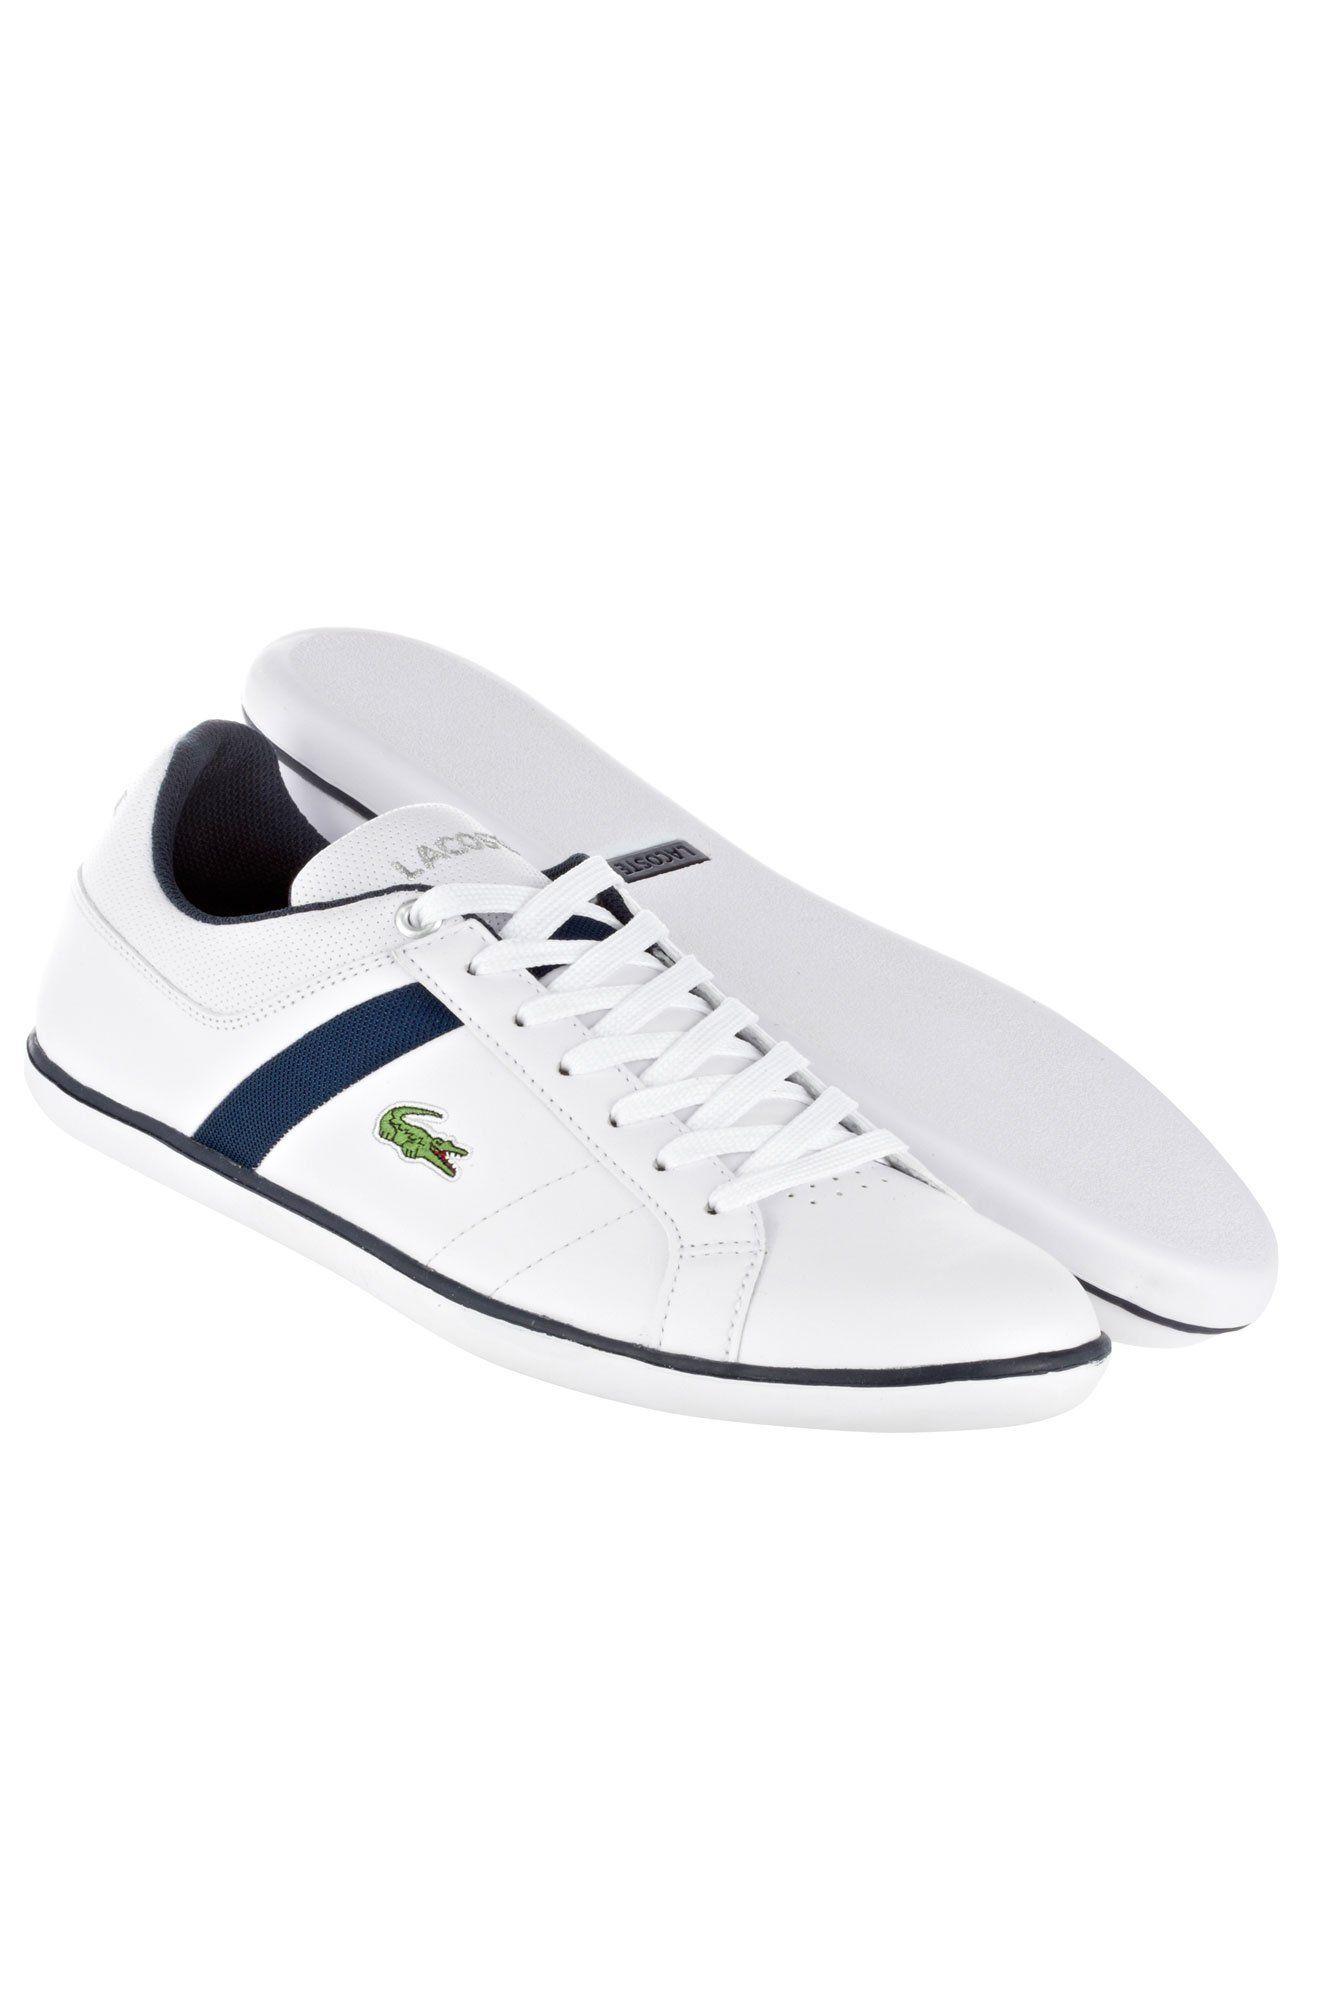 newest 6b1e8 8dcb2 Lacoste Men s Evershotcr -  100.00 Sportswear, How To Wear, Shoes, Men,  Clothes